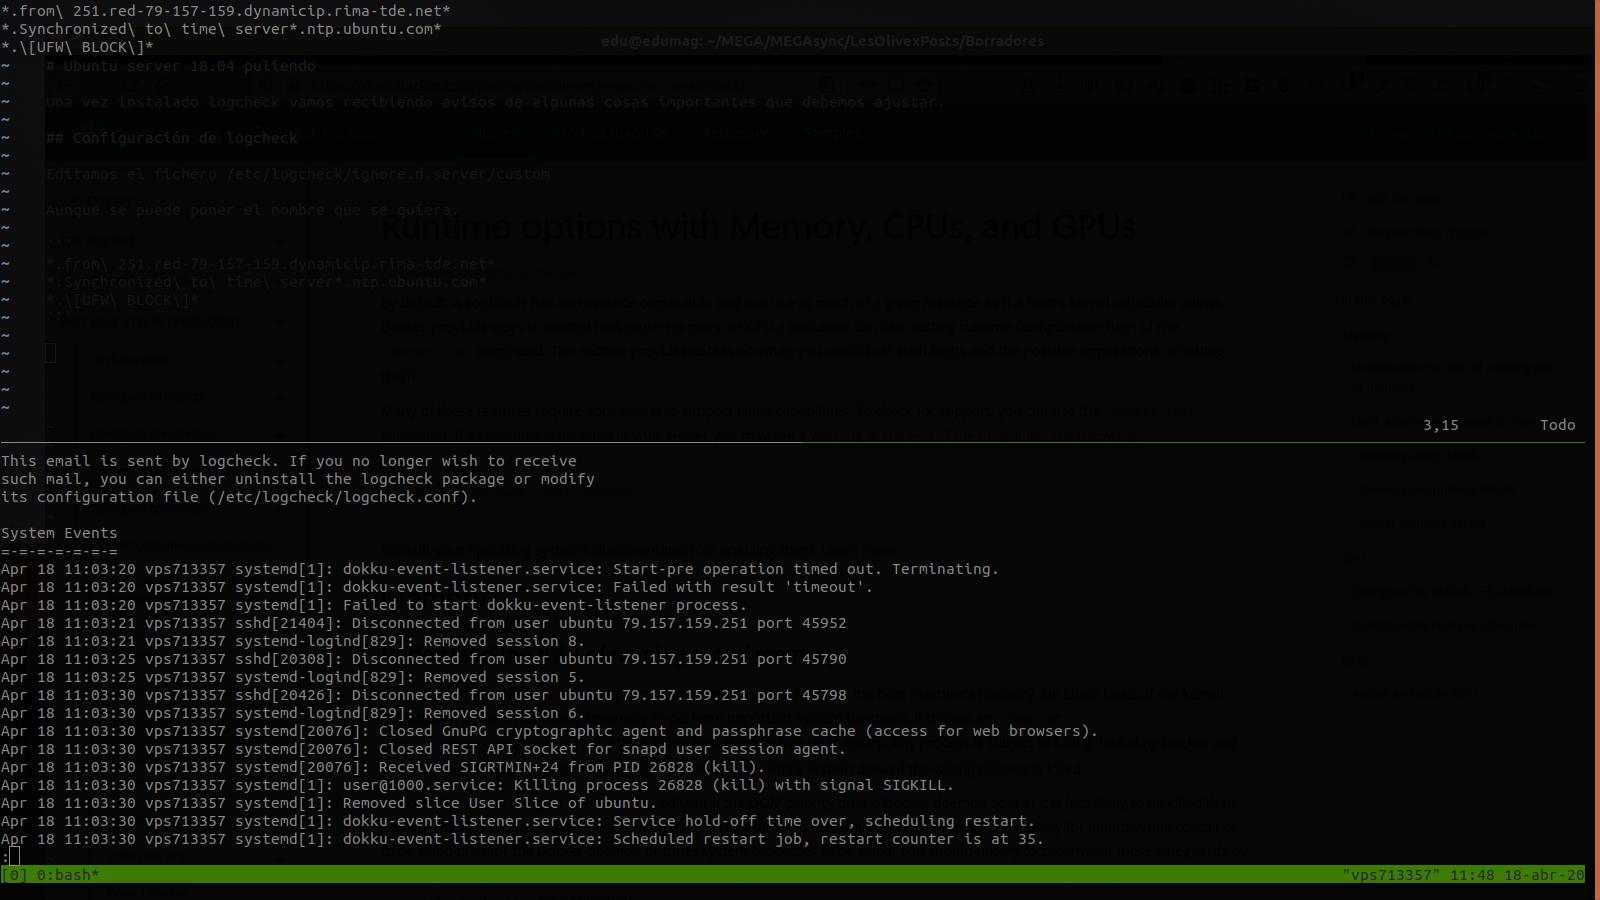 Afinando ubuntu server 18.04